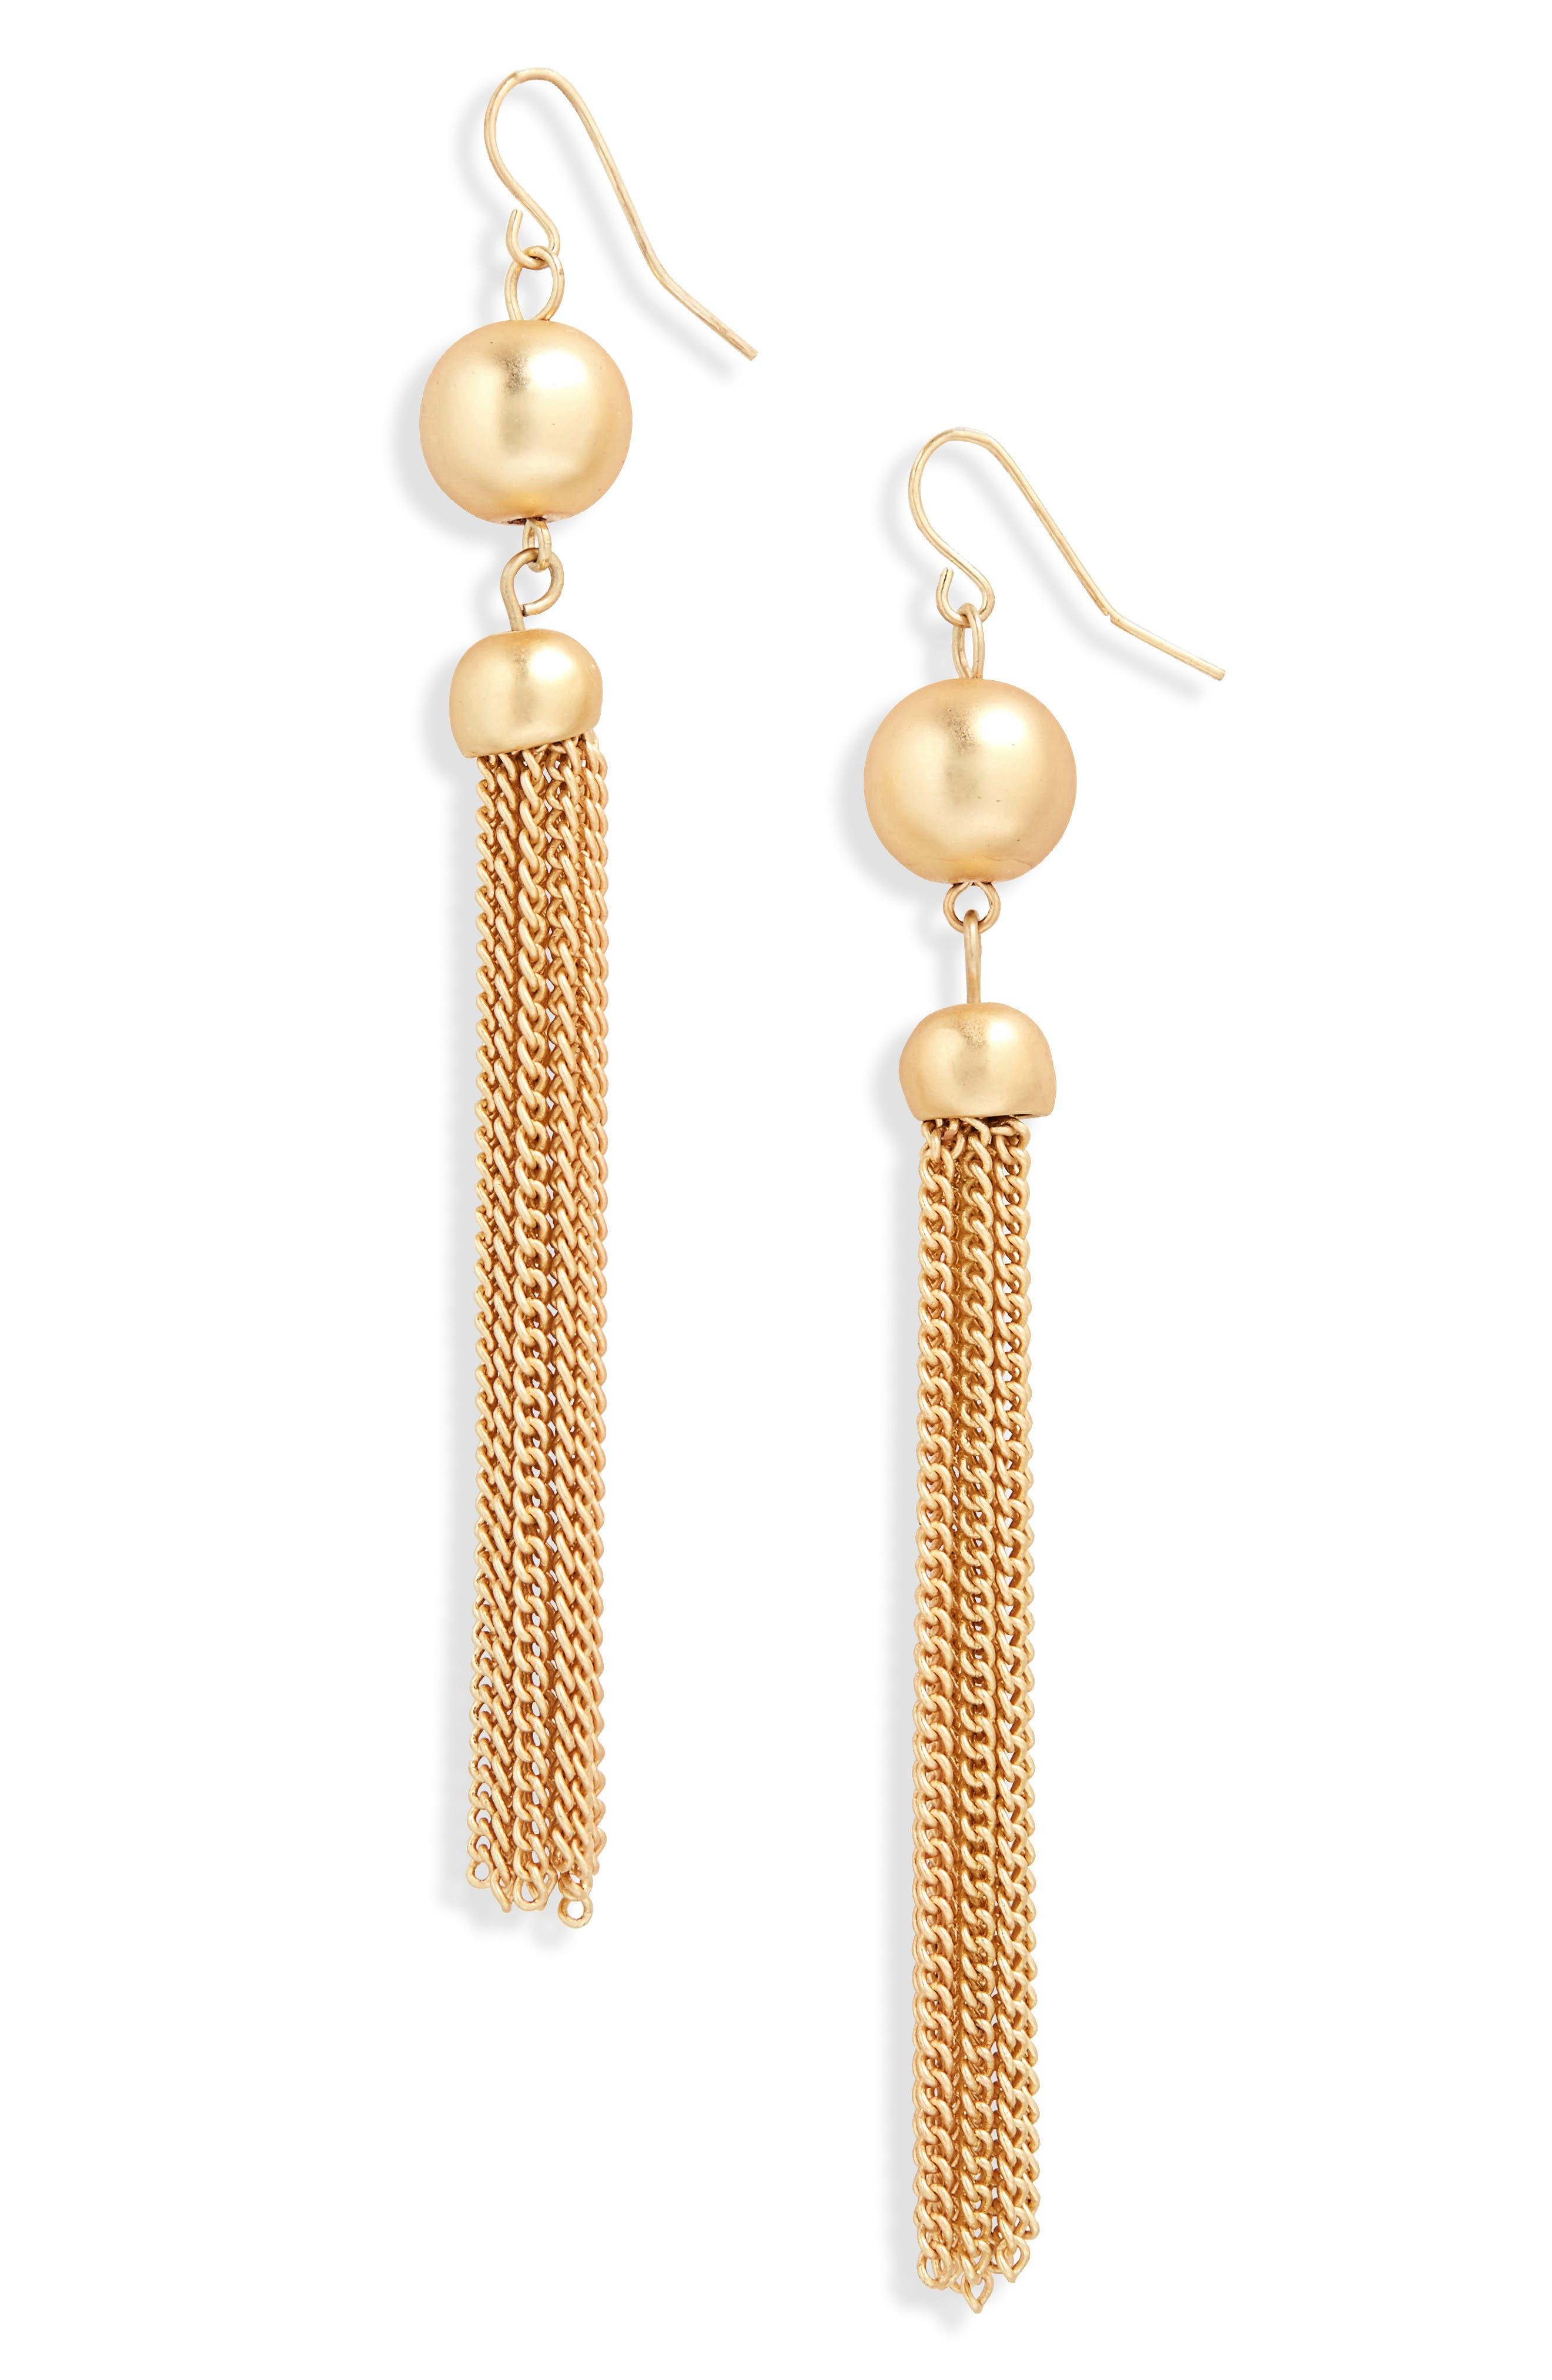 Double Drop Tassel Earrings,                             Main thumbnail 1, color,                             710